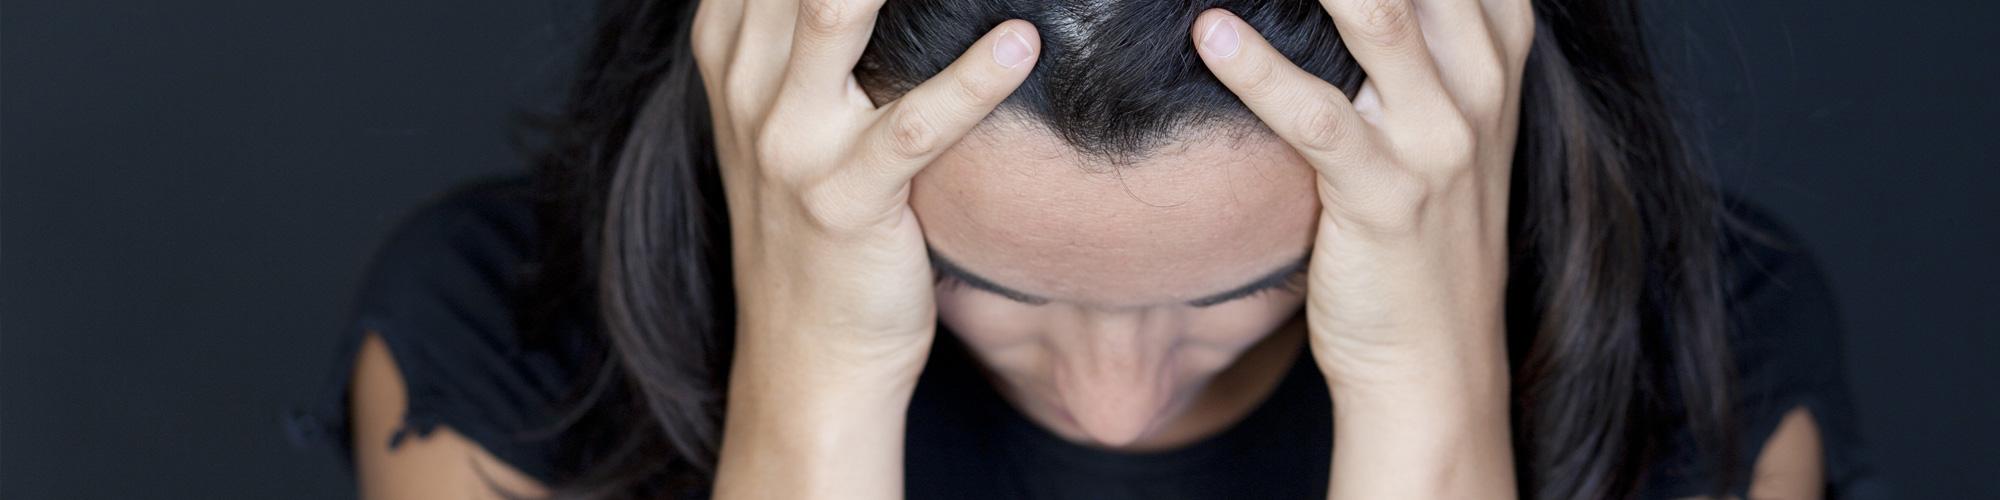 ensomhed vivi hinrichs krise sorg